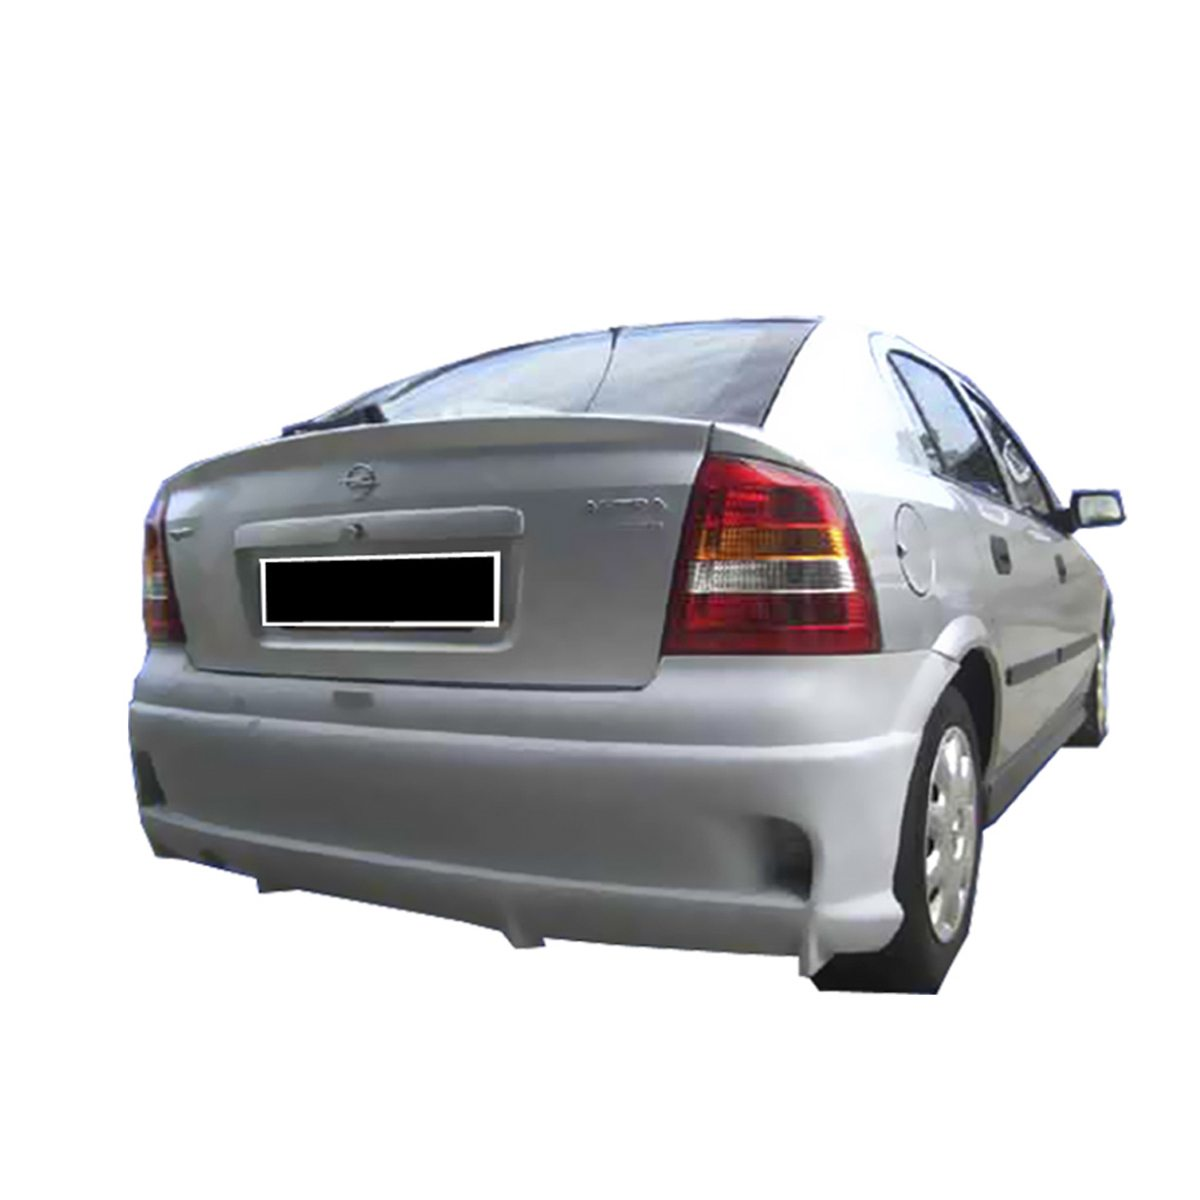 Opel-Astra-G-Apache-C-F-Tras-PCU0390